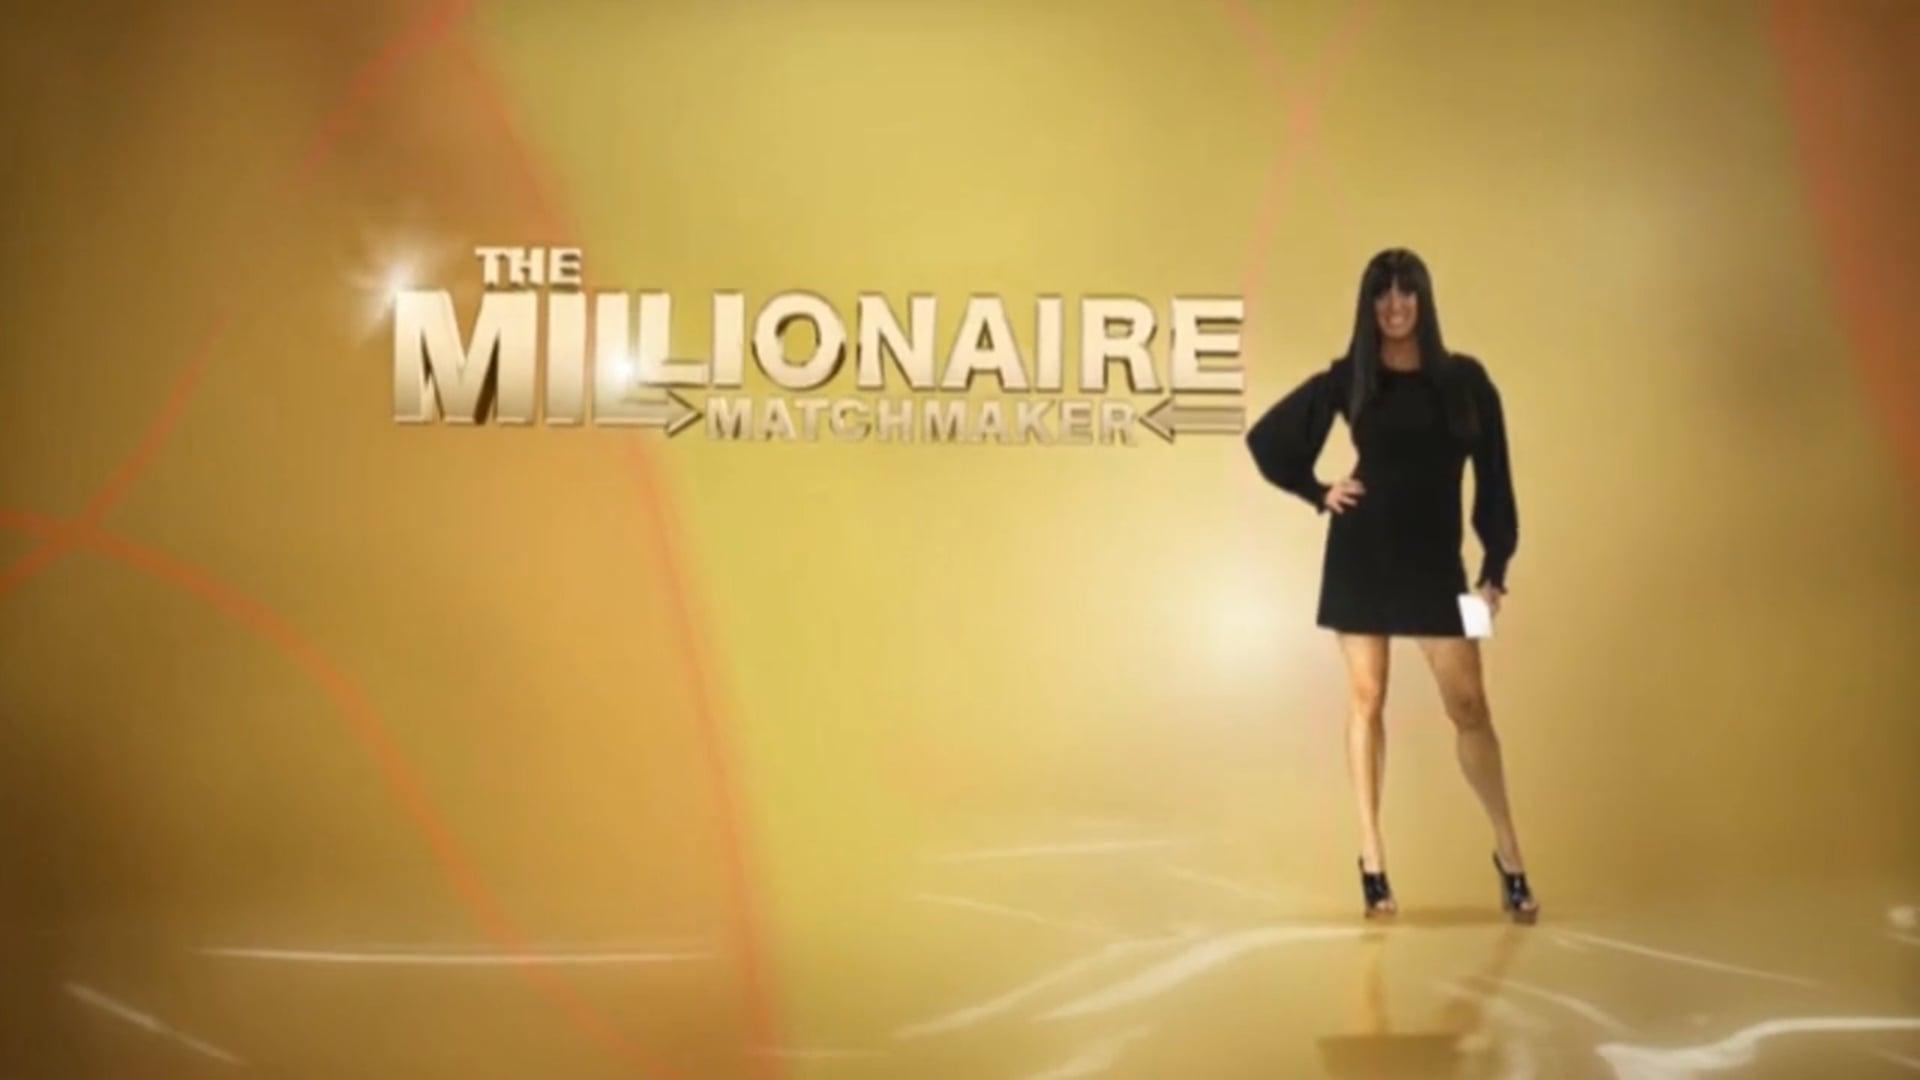 Millionaire Matchmaker | Theme Song